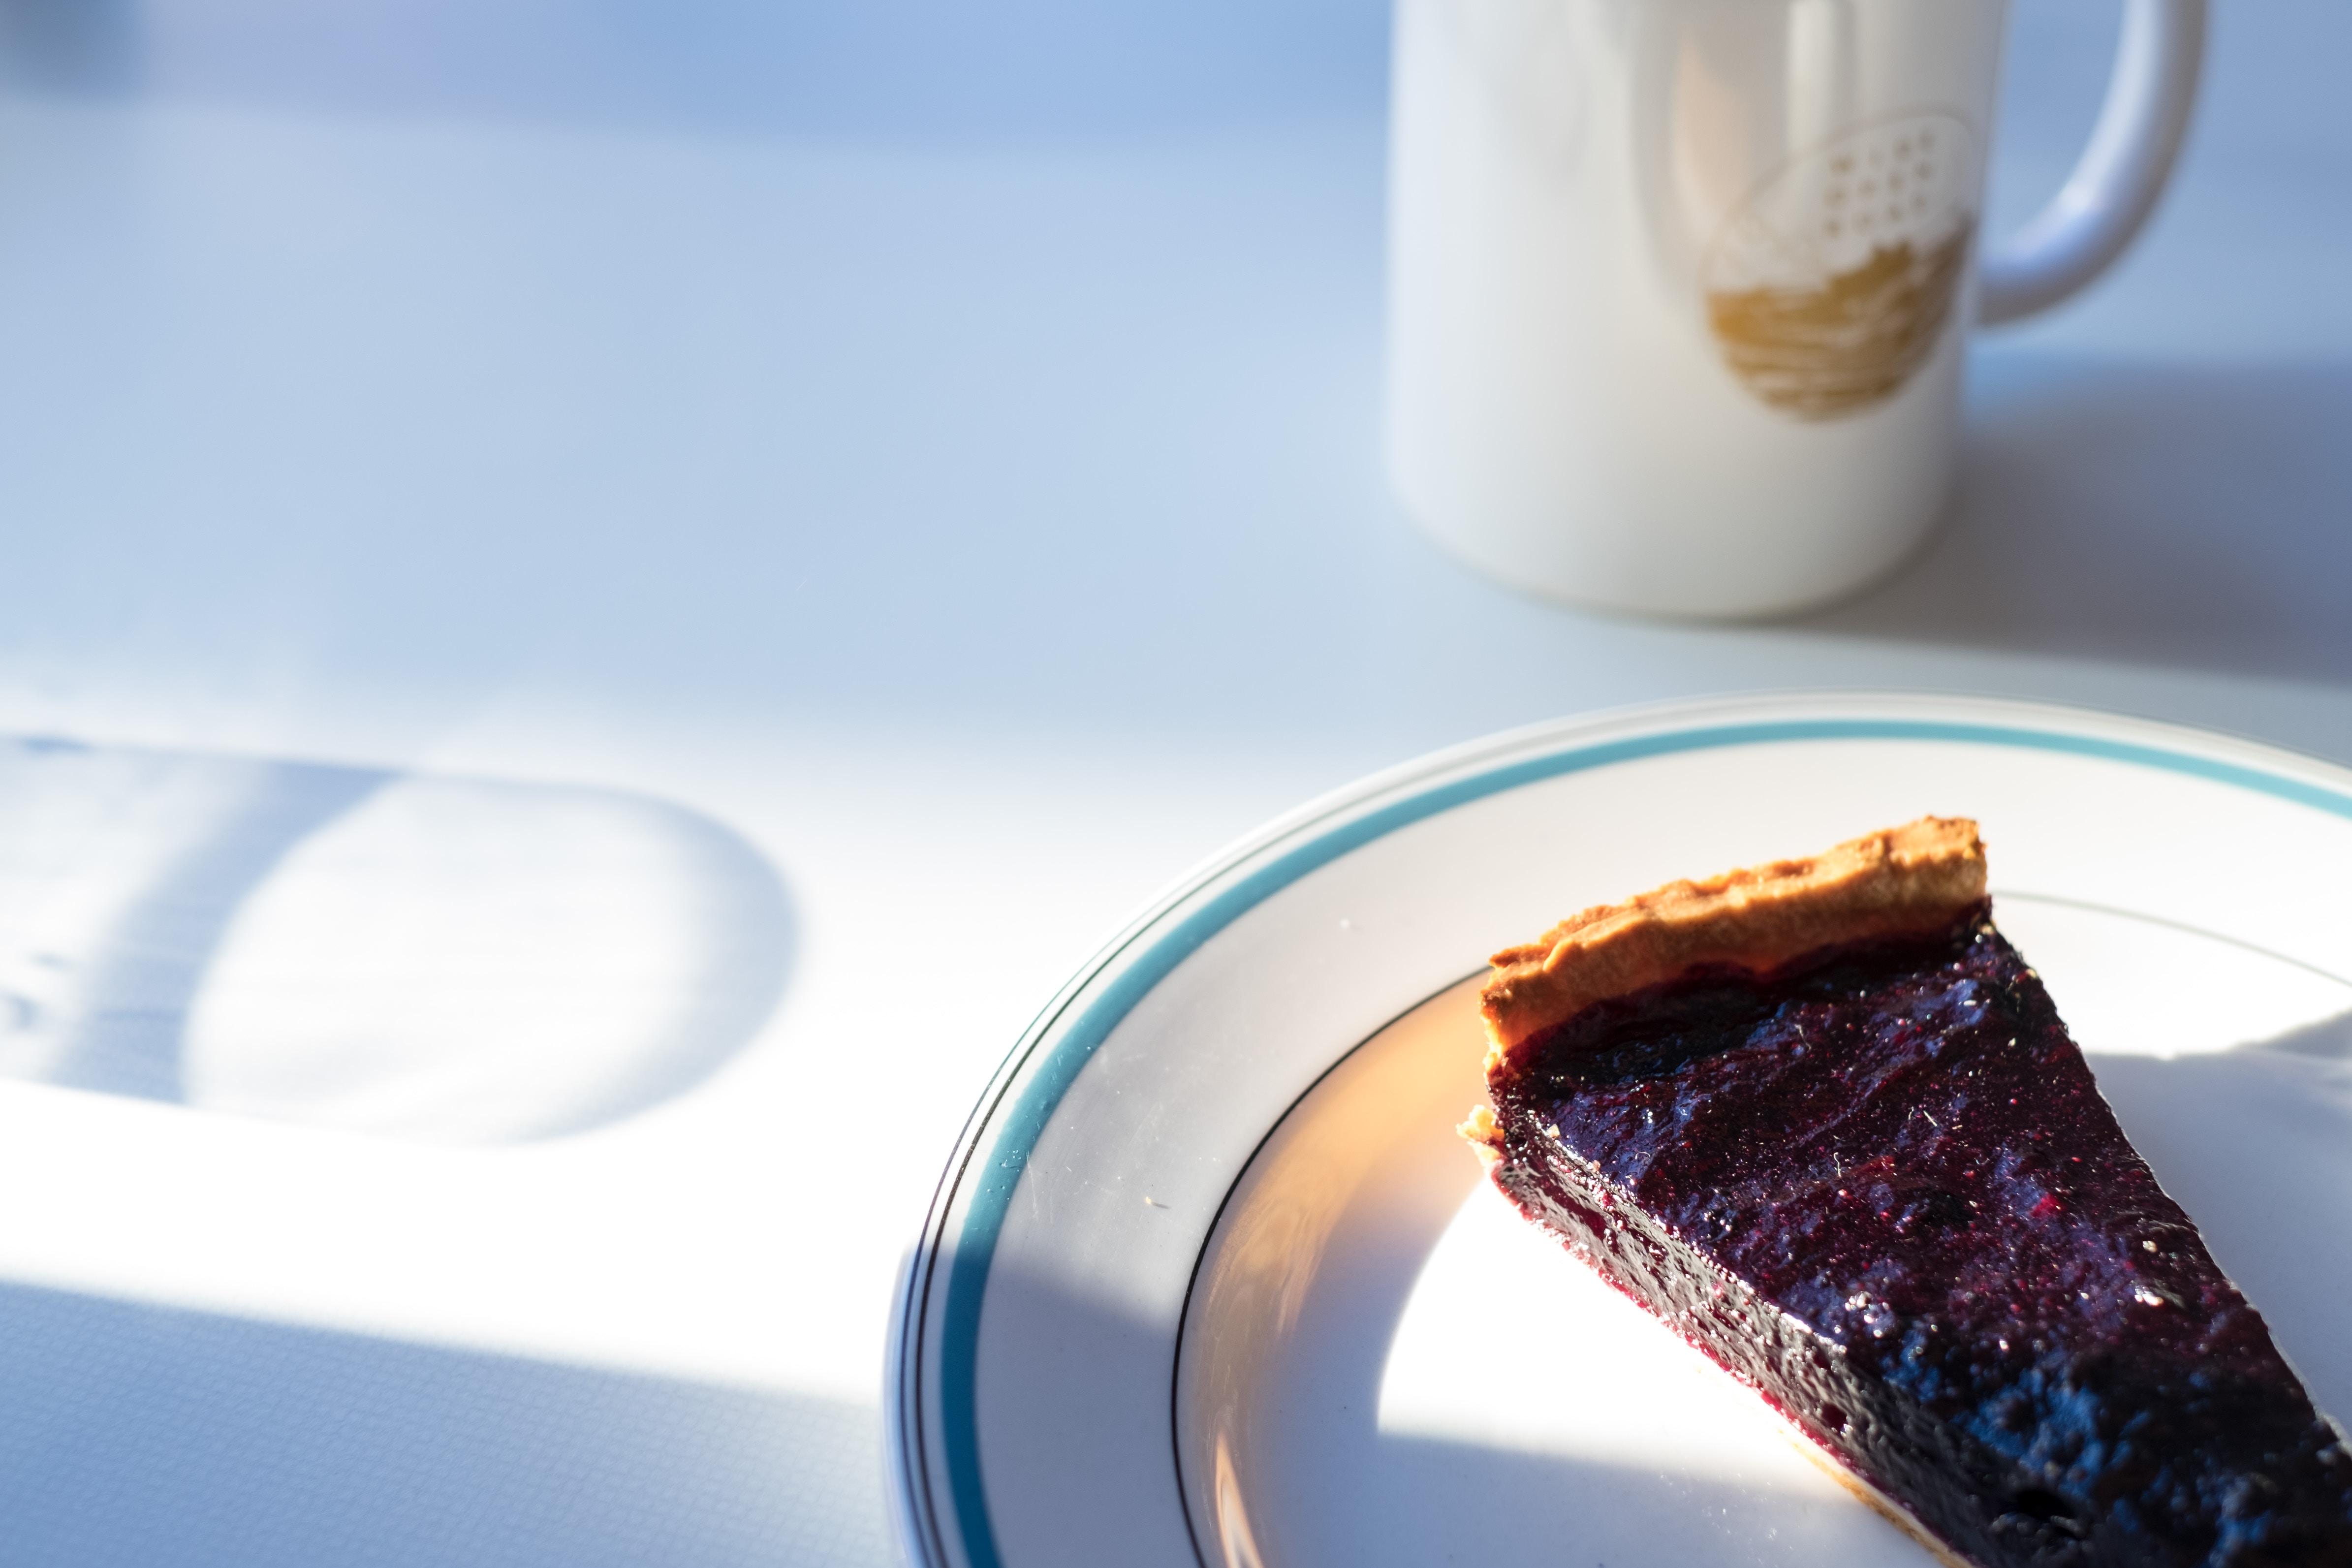 closeup photo of sliced cake on white plate